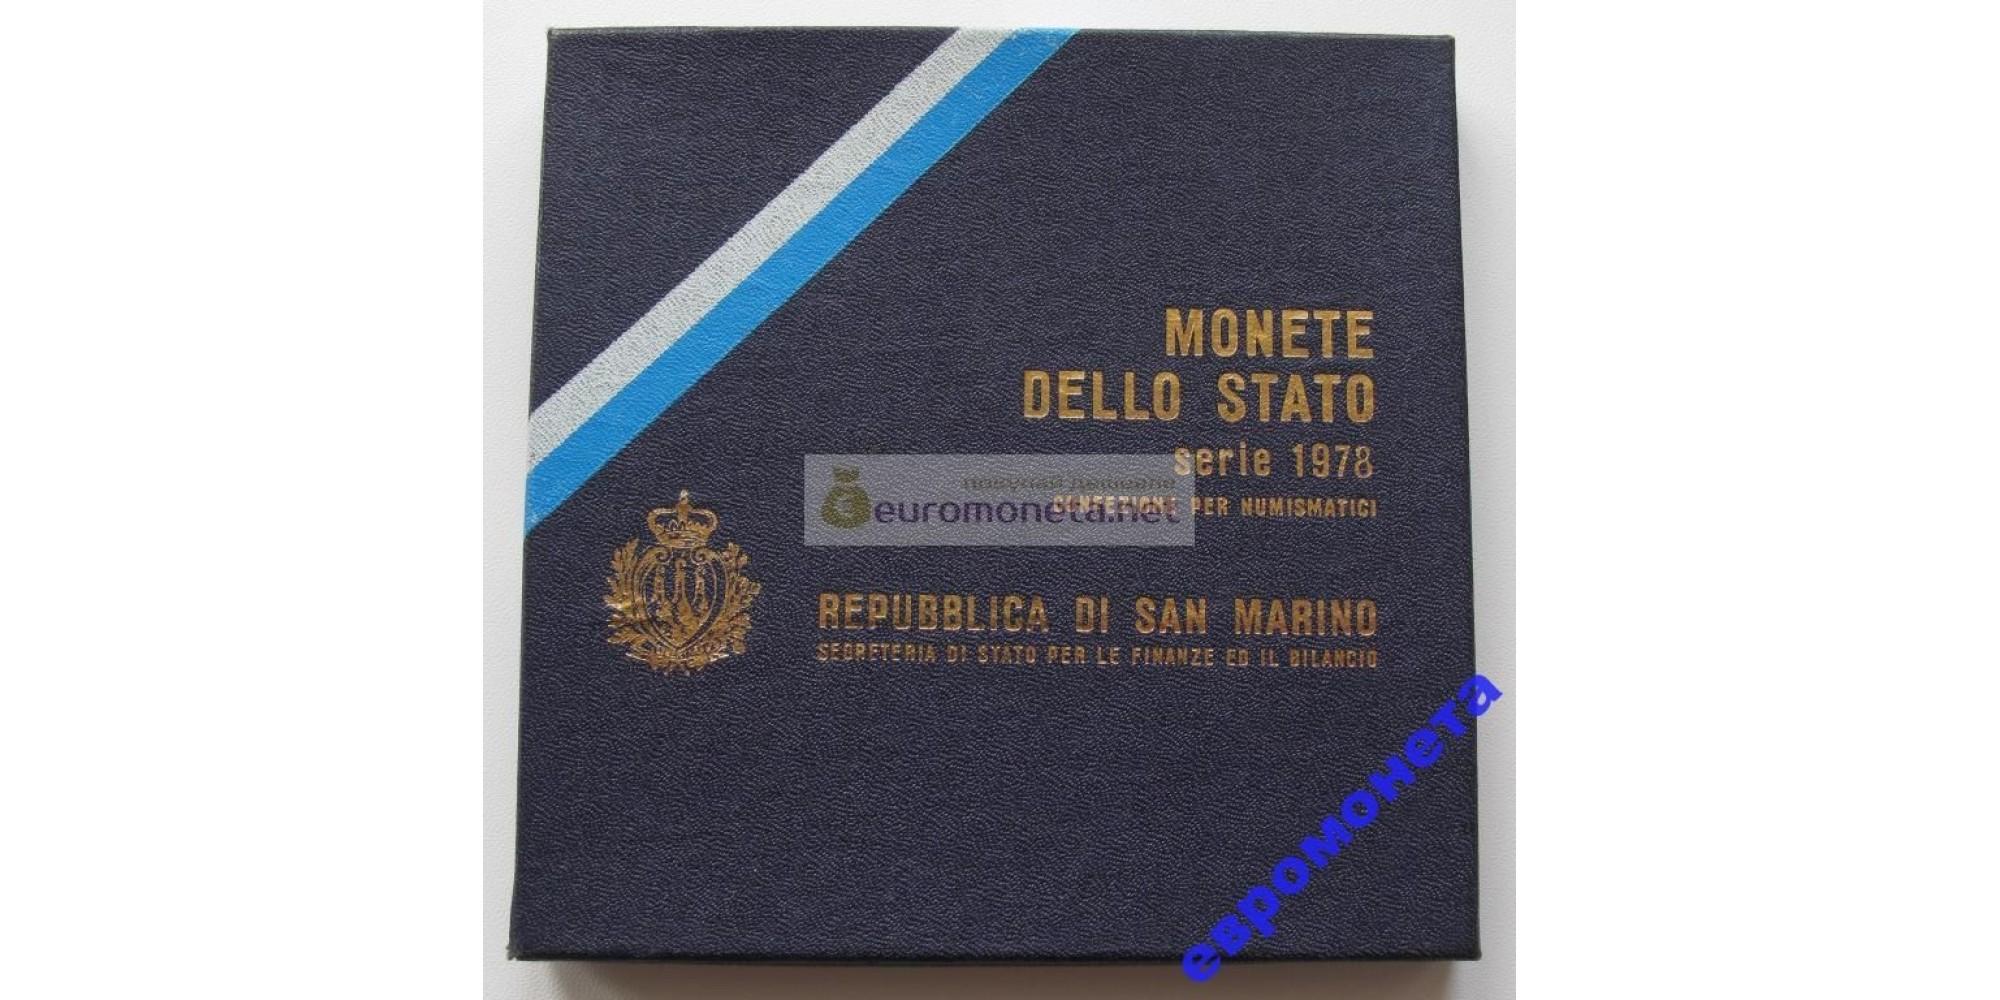 Сан-Марино набор монет 1978 год 9 монет включая 500 лир серебро UNC